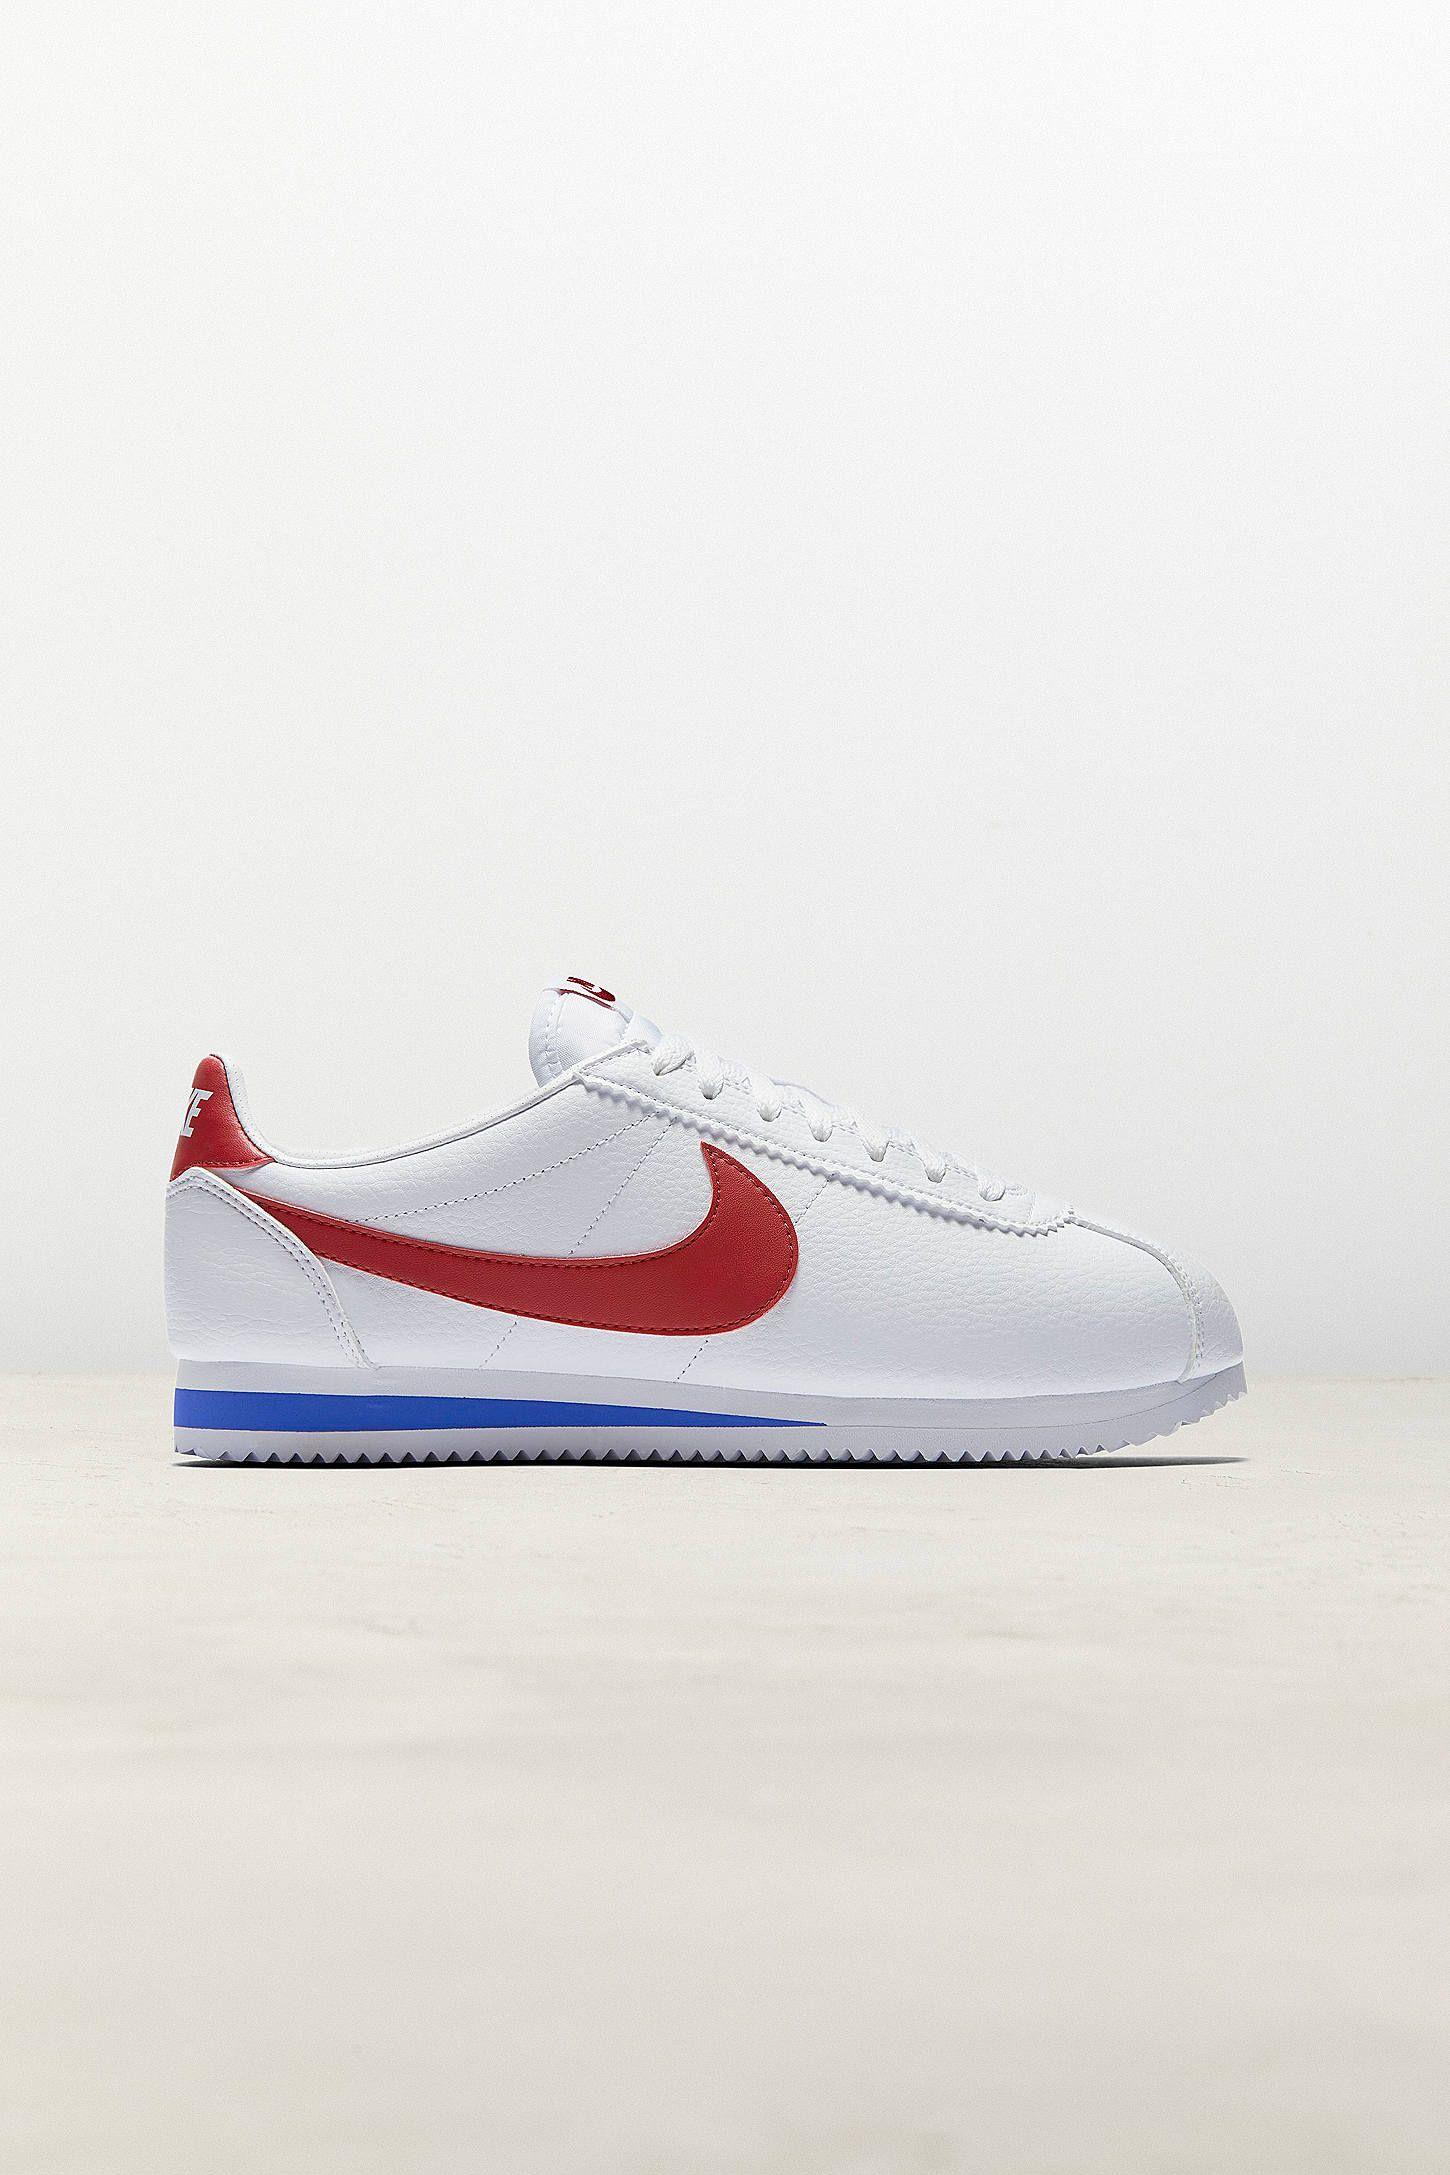 e6188fa6 Nike Cortez Basic Leather OG Sneaker in 2019 | Shoes | Nike, Sneakers, Nike  cortez